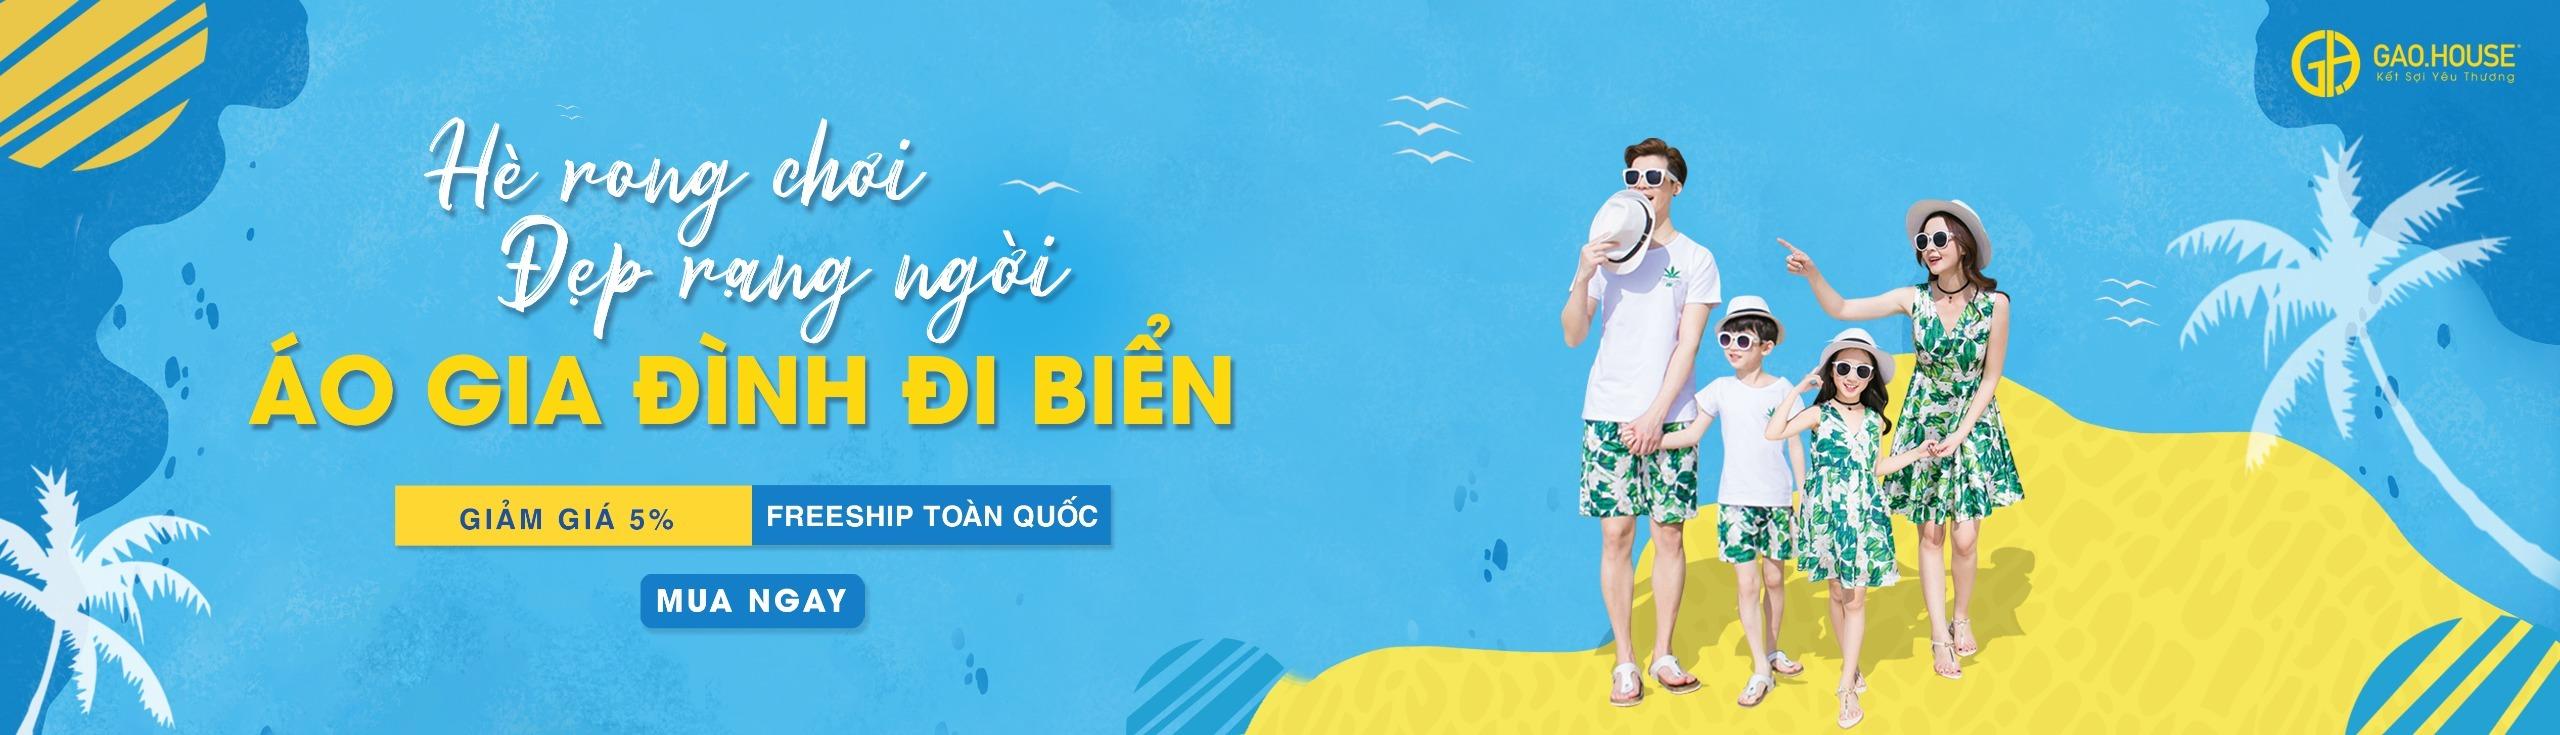 xuongaogiadinh (@xuongaogiadinh) Cover Image